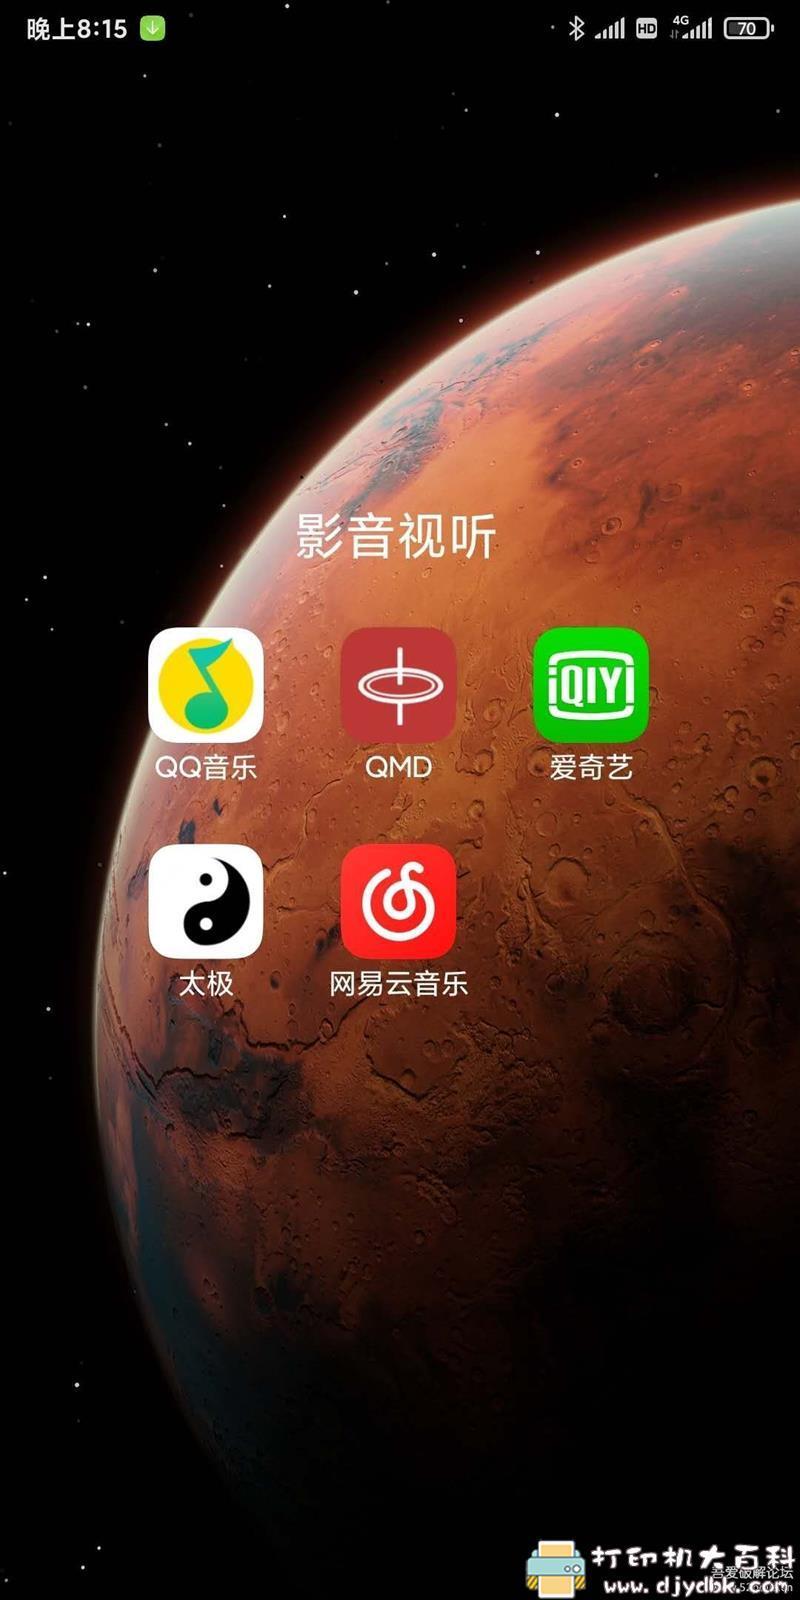 [Android]安卓音乐下载软件(包括各种VIP音乐)图片 No.1